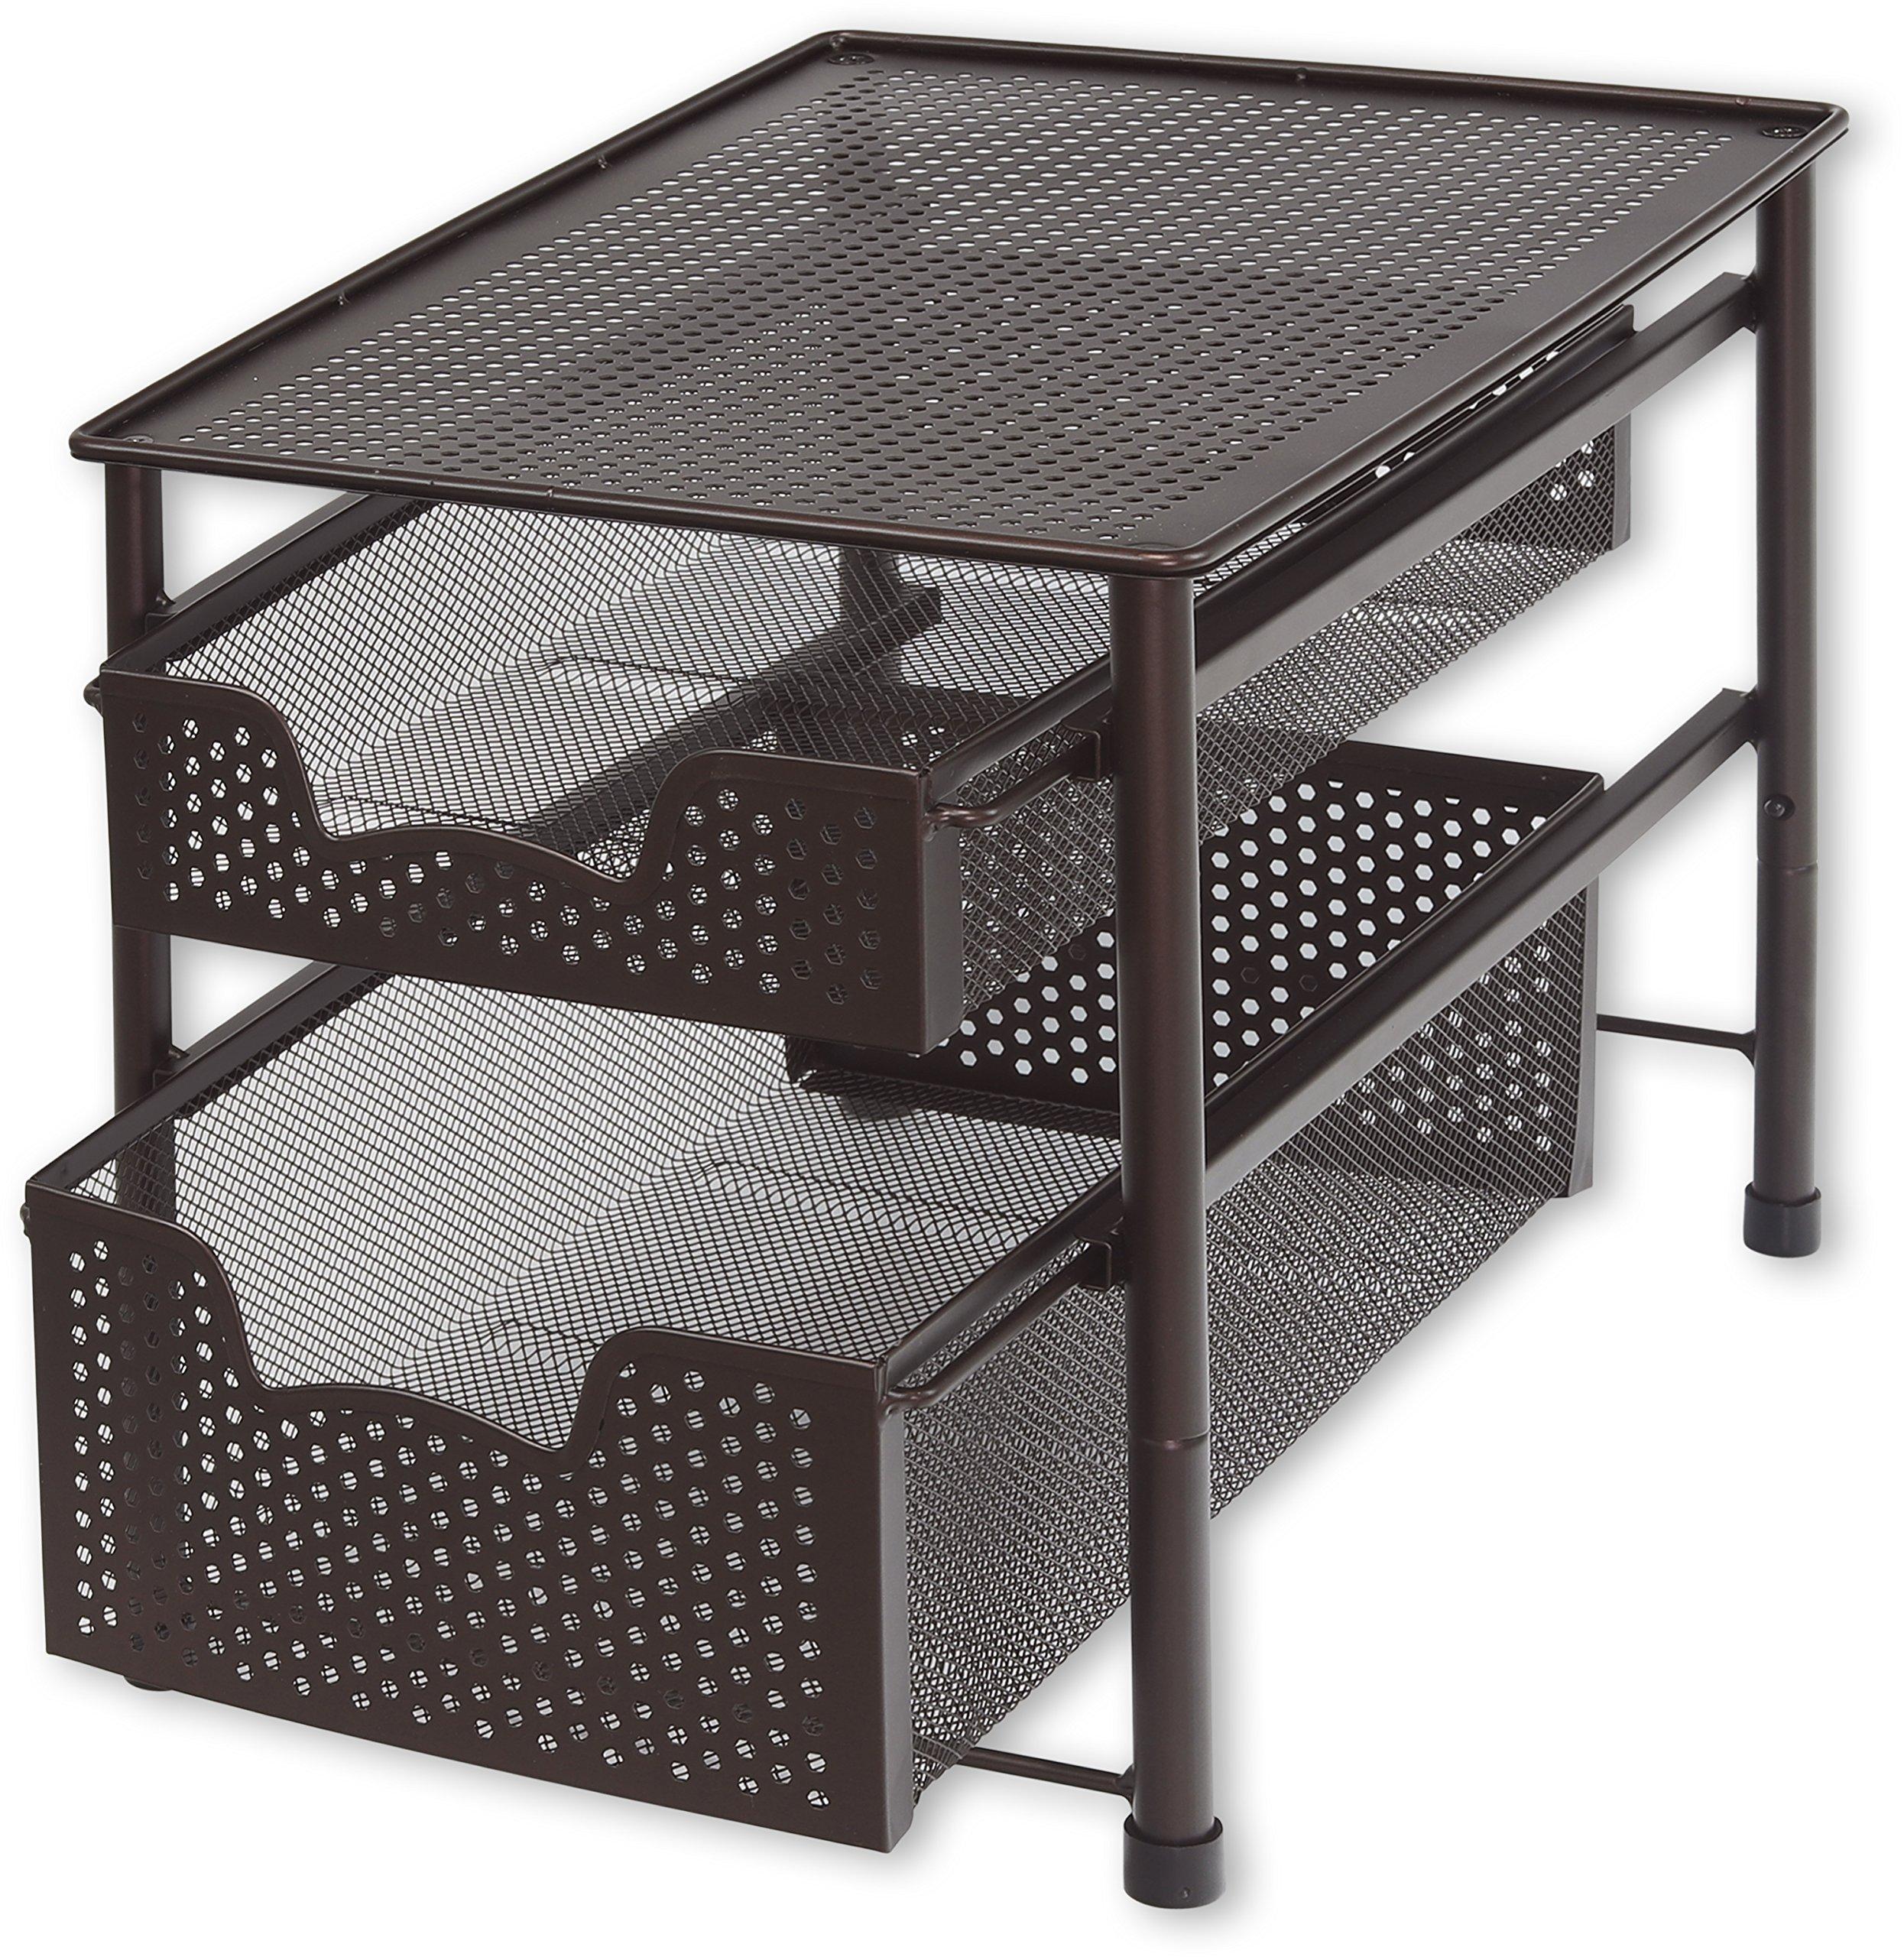 Simple Houseware Stackable 2 Tier Sliding Basket Organizer Drawer, Bronze